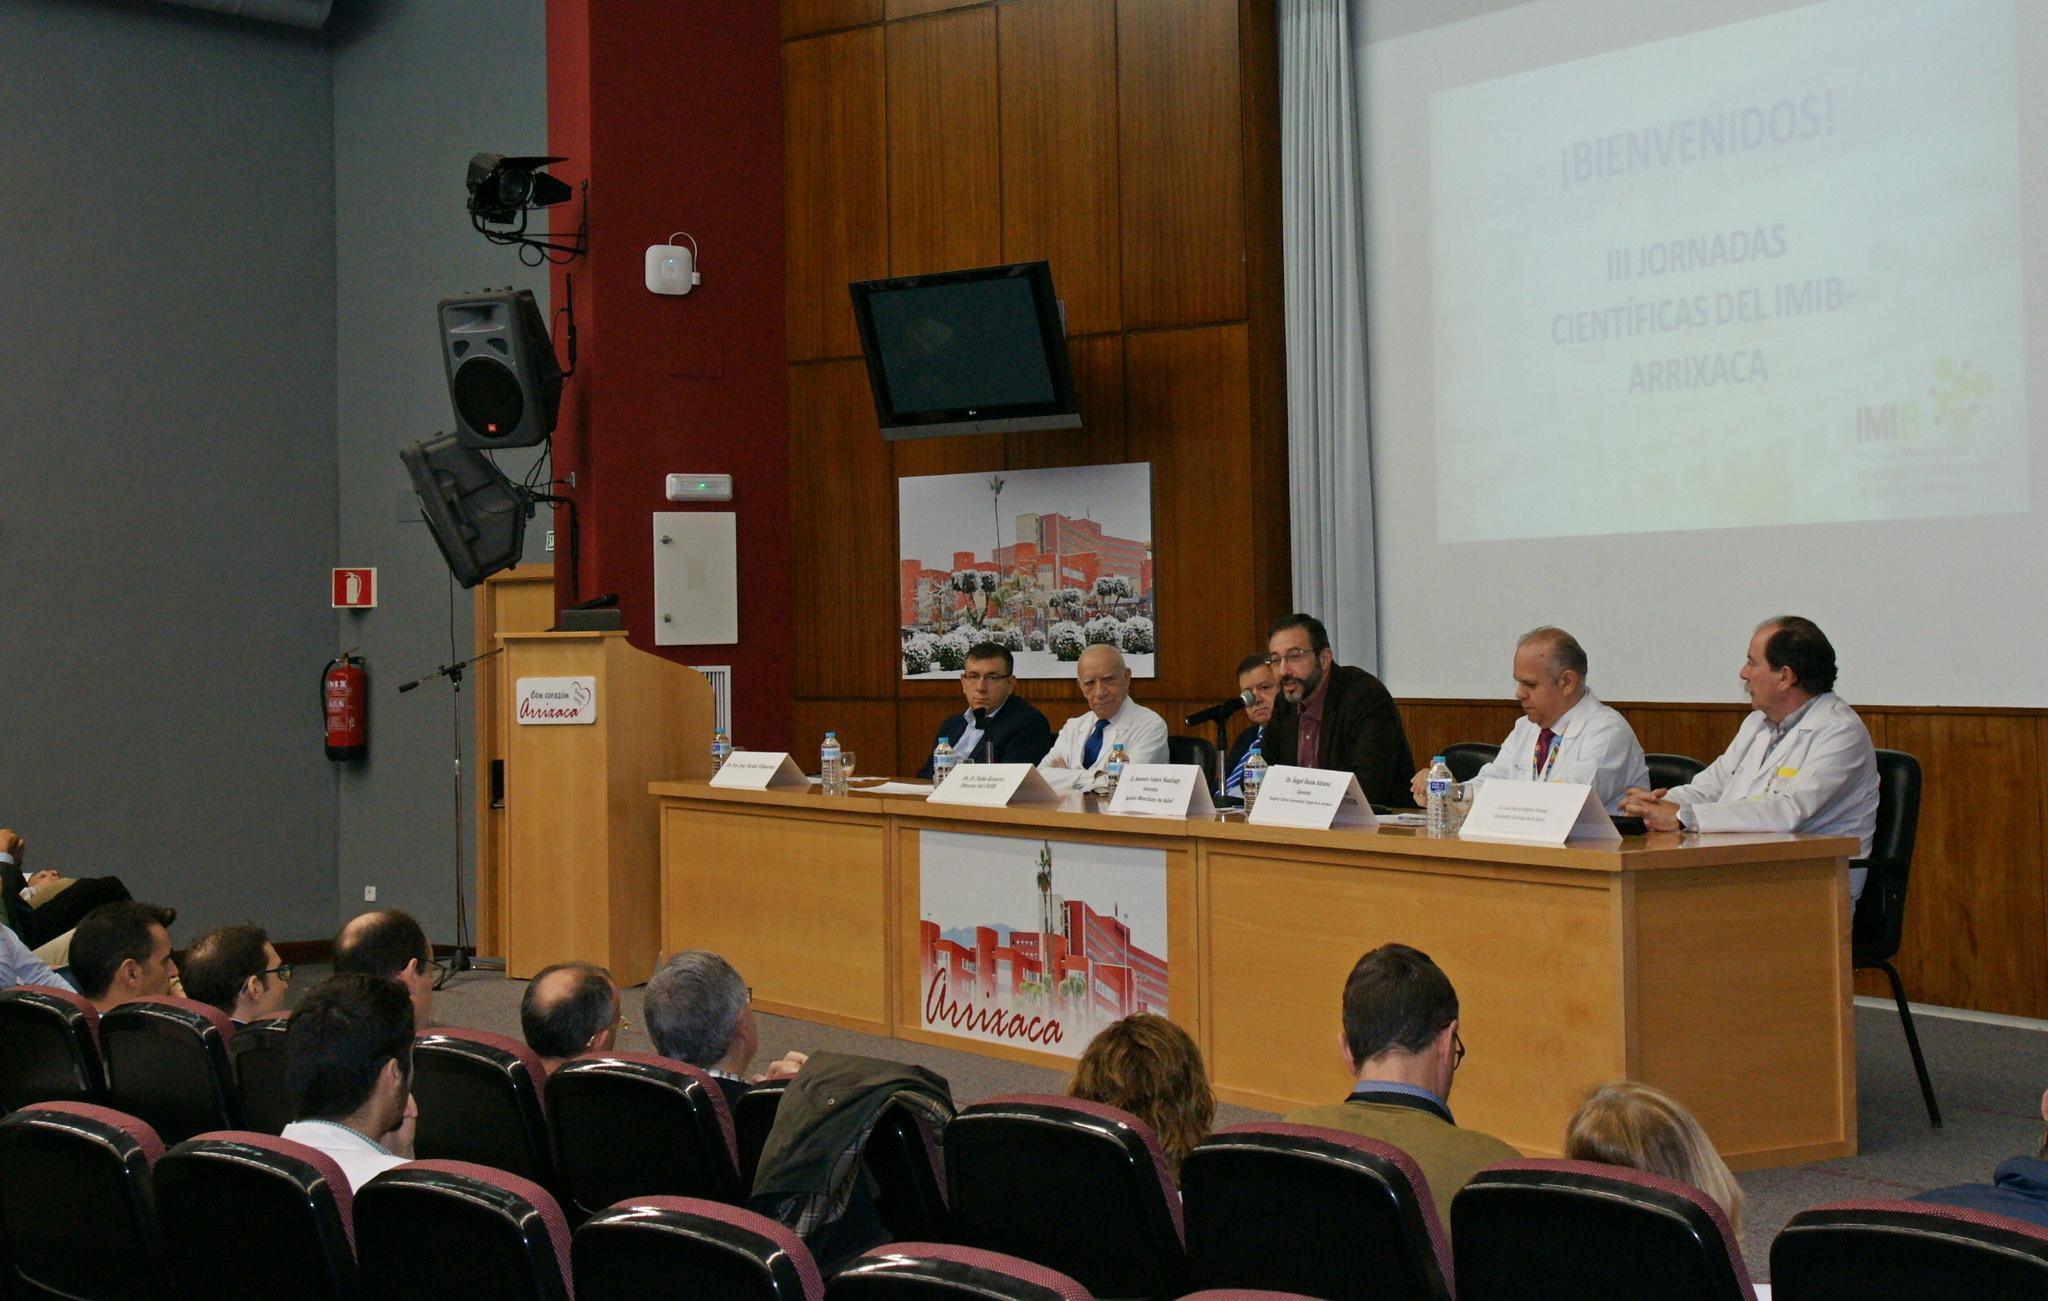 Celebradas las III Jornadas Científicas del IMIB-Arrixaca